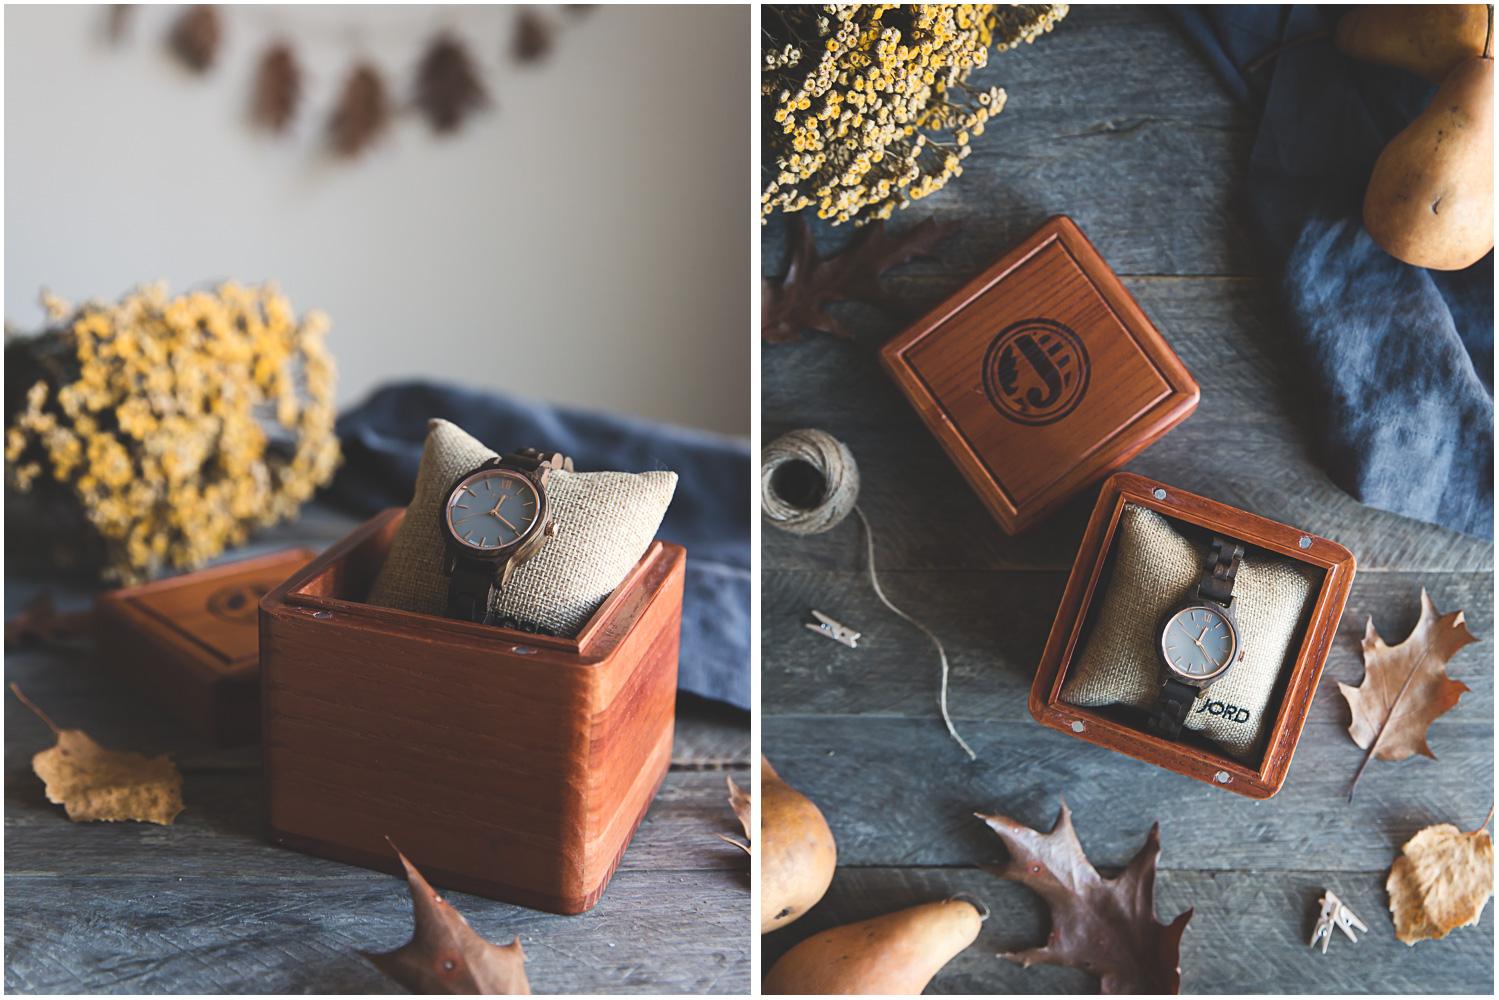 JORD Frankie wooden watch in its packaging